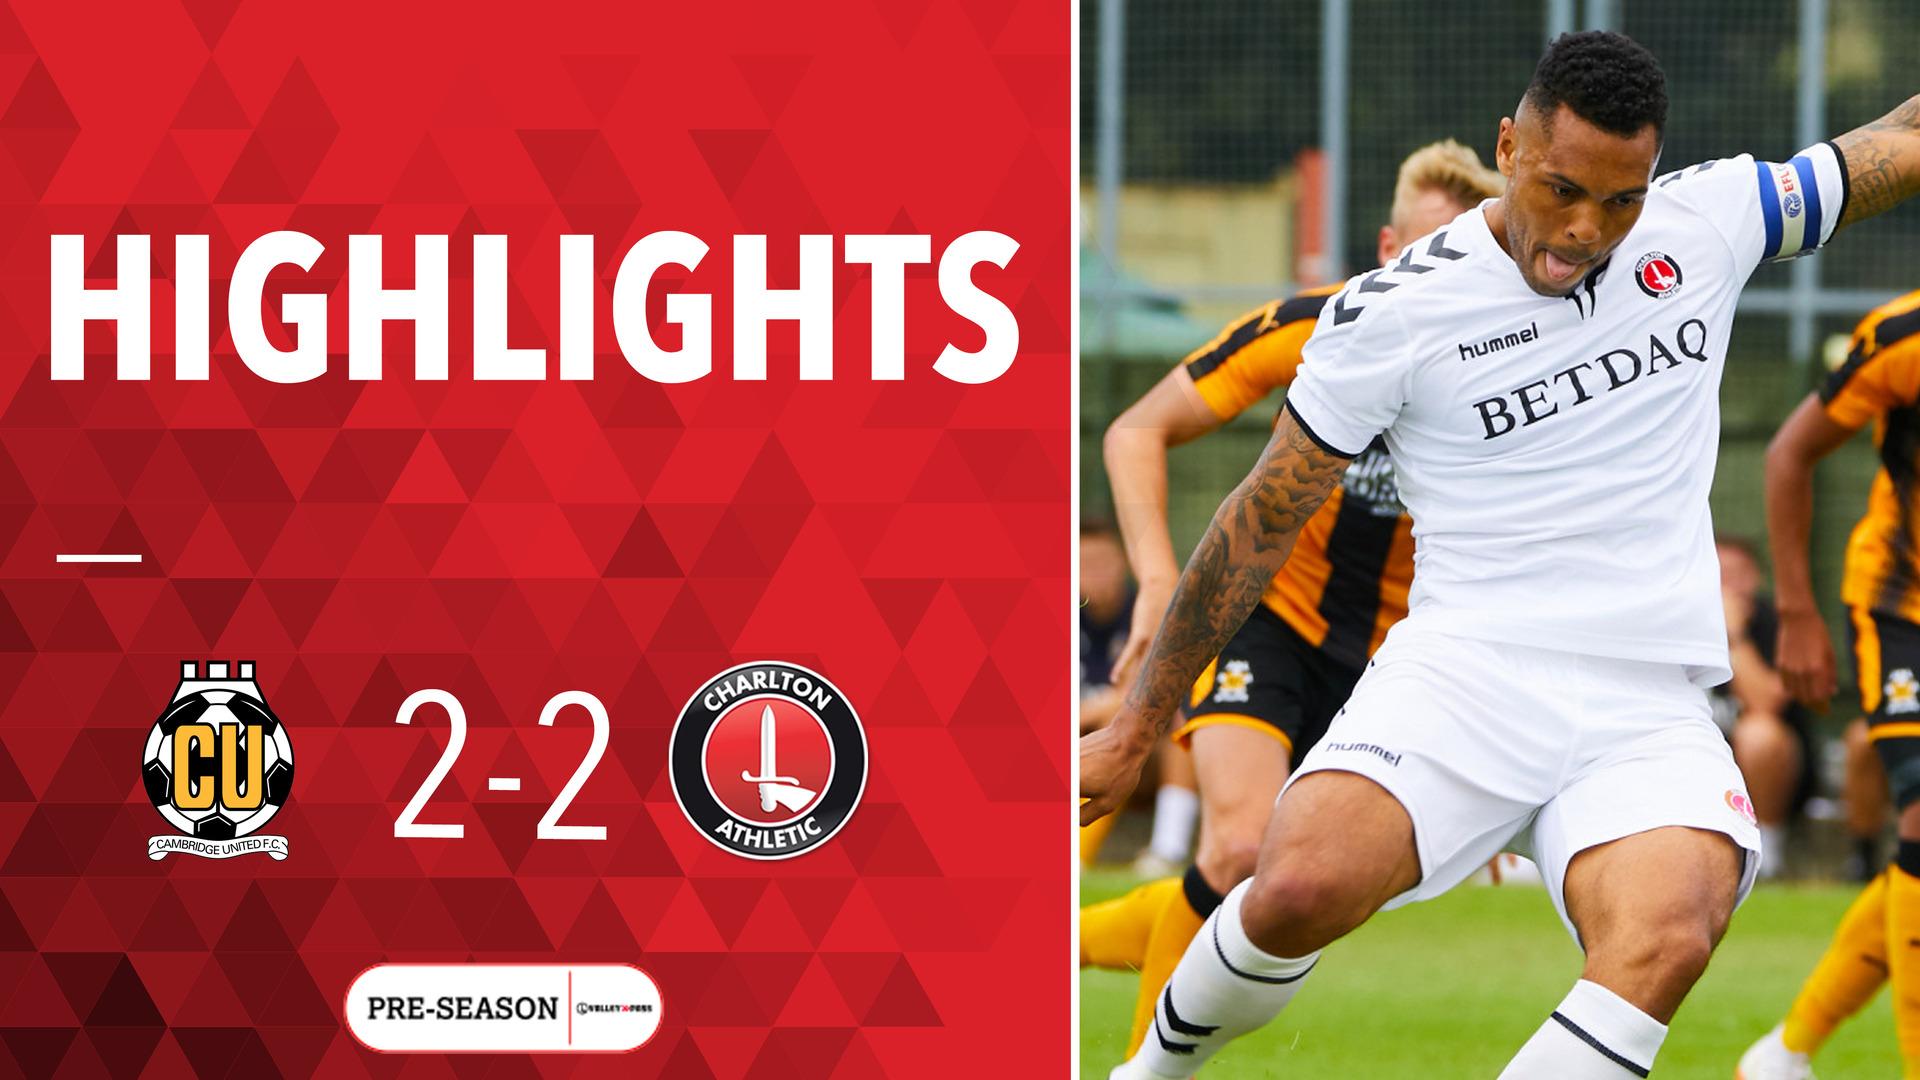 HIGHLIGHTS | Charlton 2 Cambridge 2 (Pre-season July 2018)